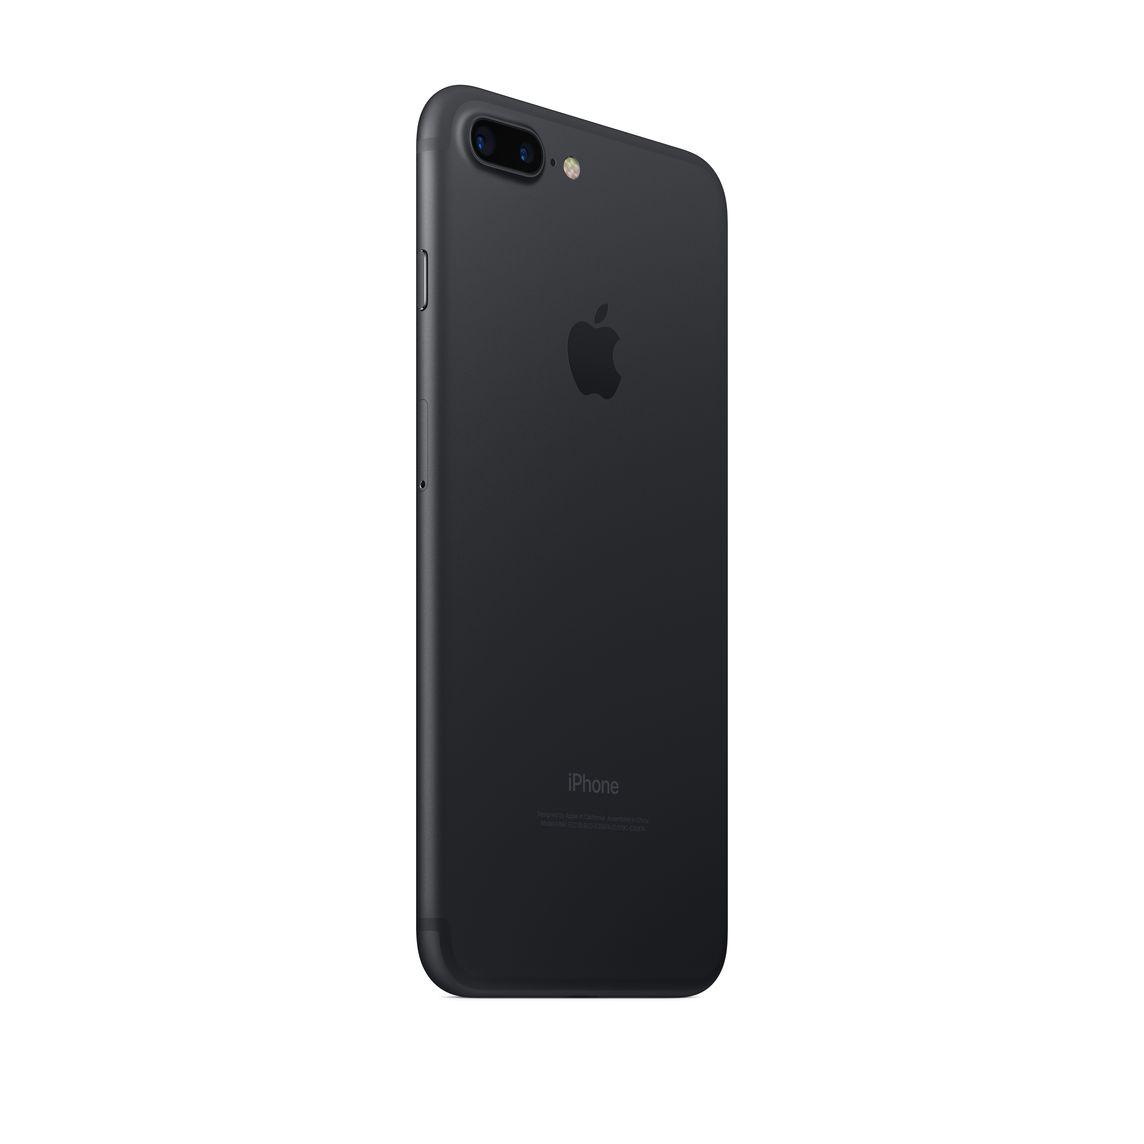 Refurbished iPhone 7 Plus 256GB - Black (Unlocked)